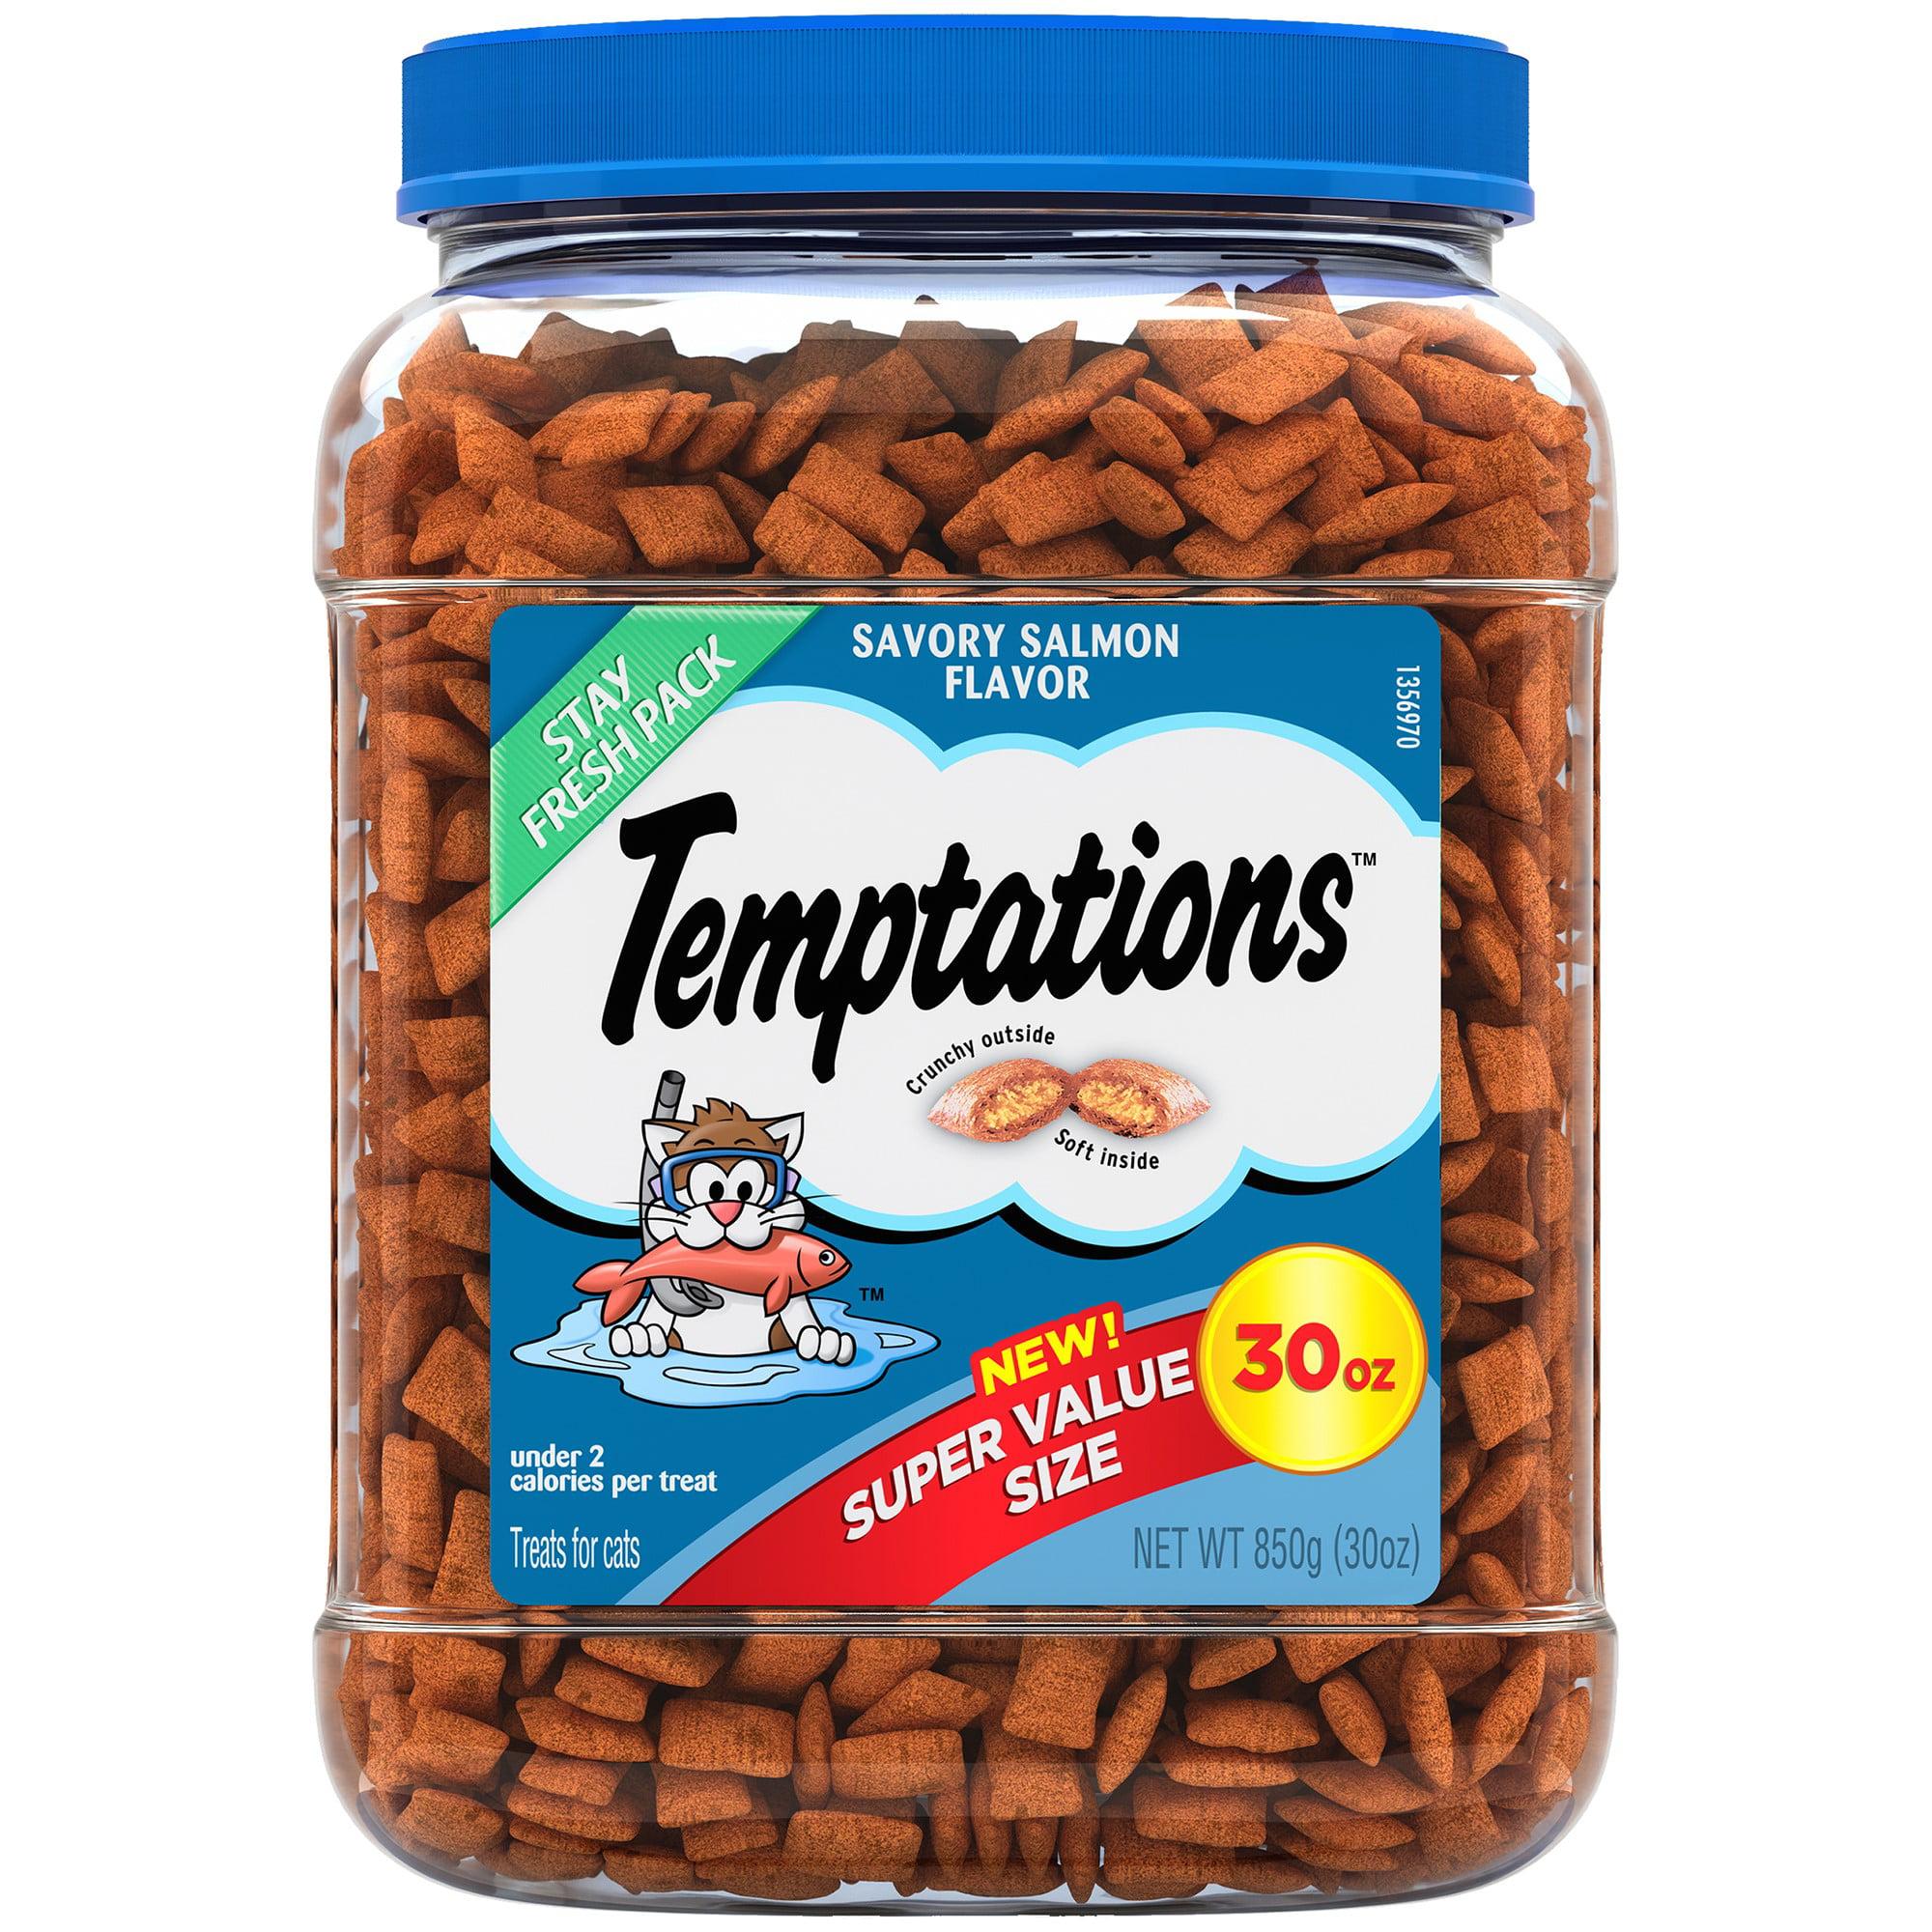 TEMPTATIONS Classic Cat Treats Savory Salmon Flavor, 30 oz. Tub by Mars Petcare